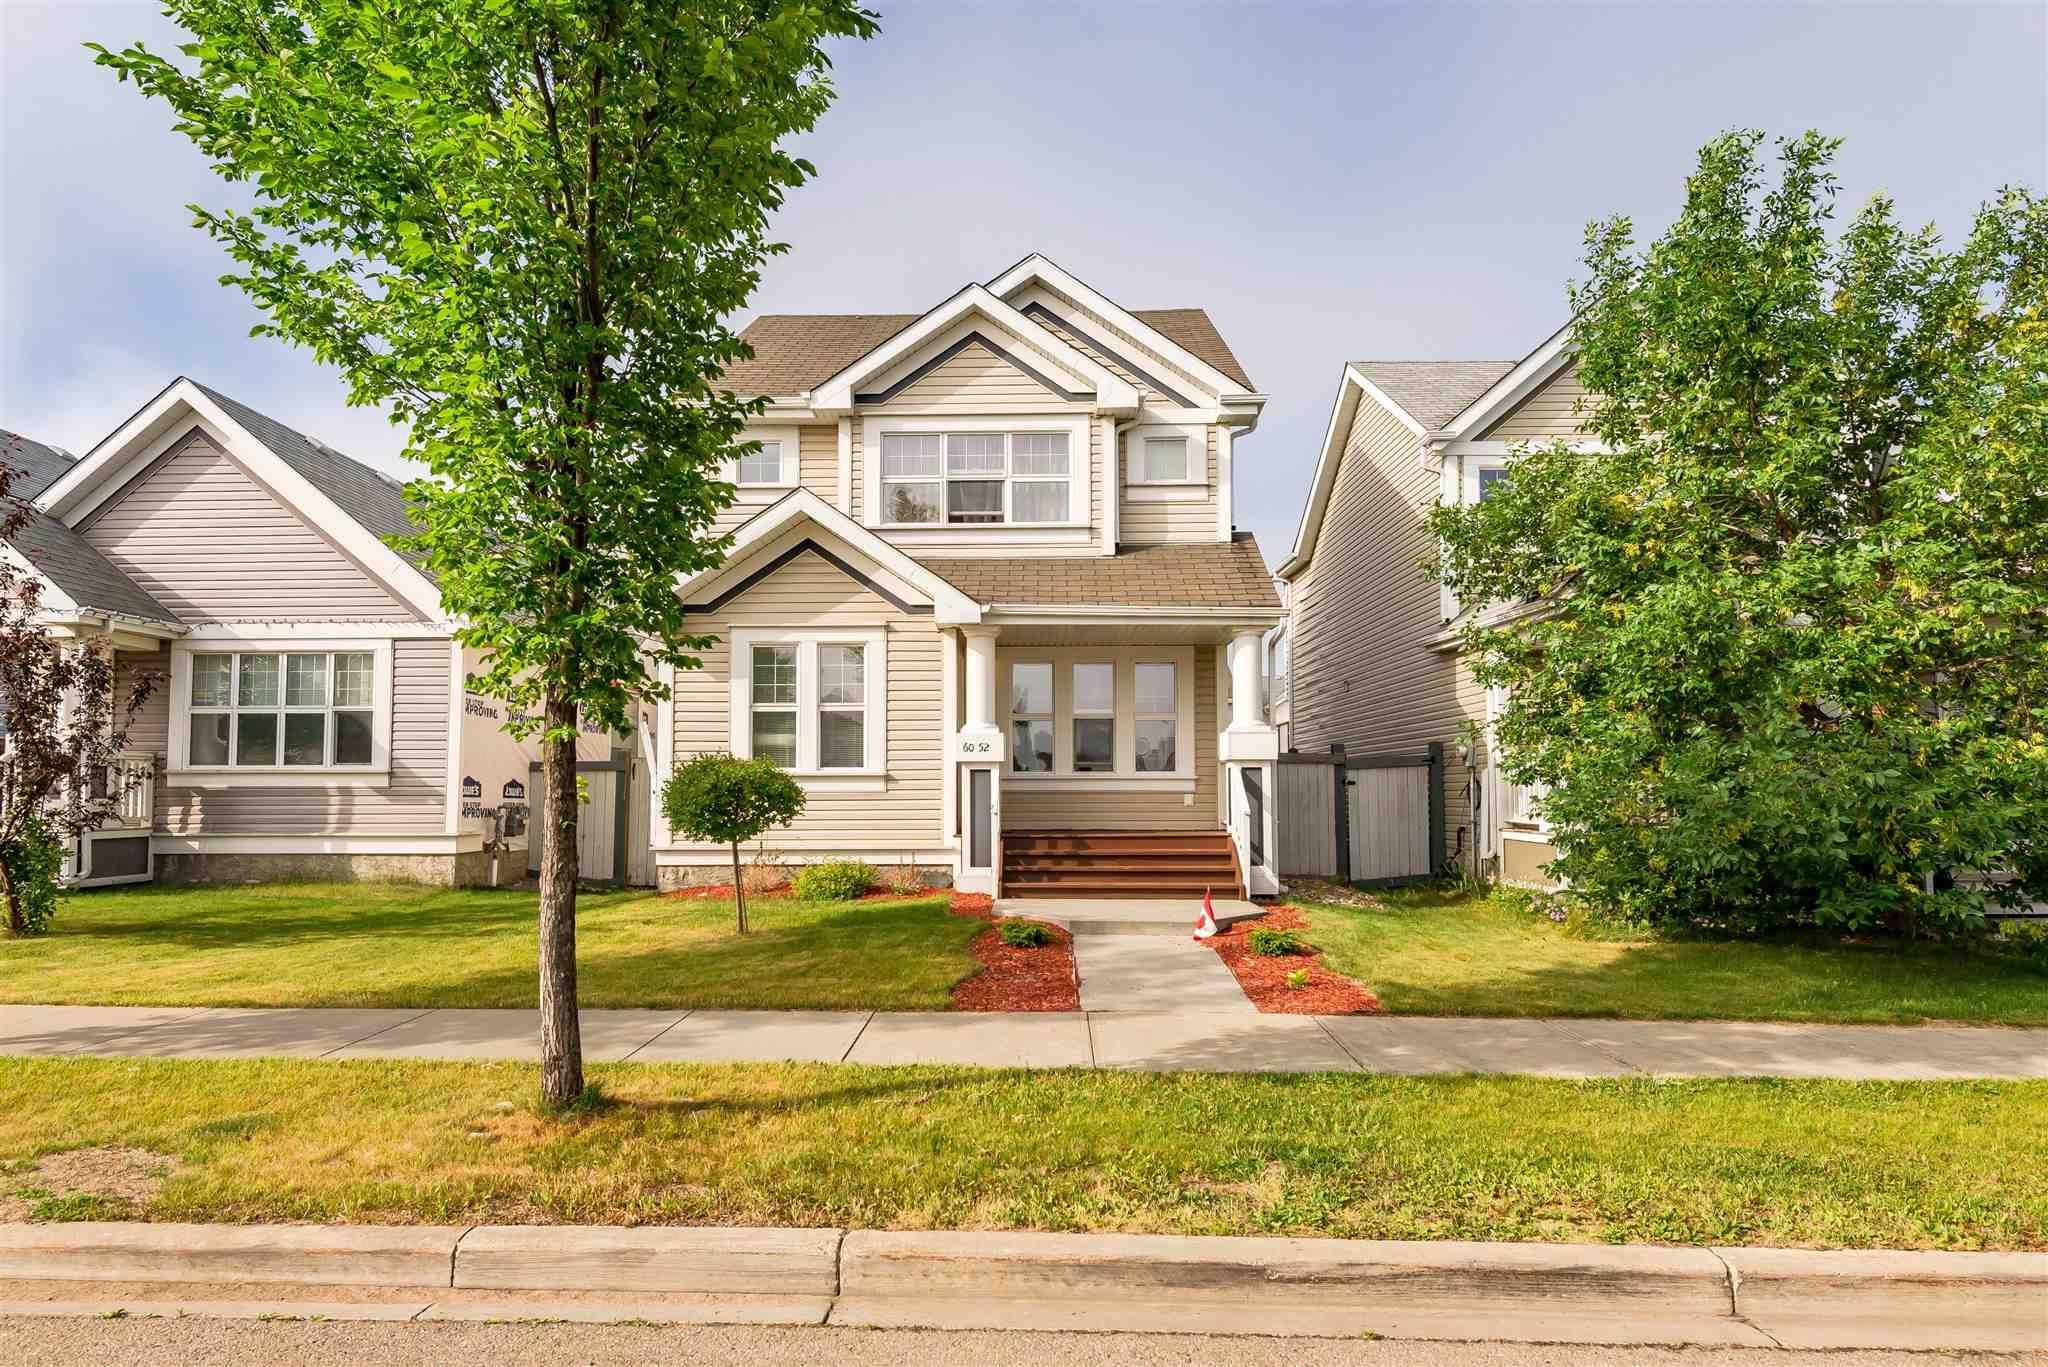 Main Photo: 6052 STANTON Drive in Edmonton: Zone 53 House for sale : MLS®# E4253474